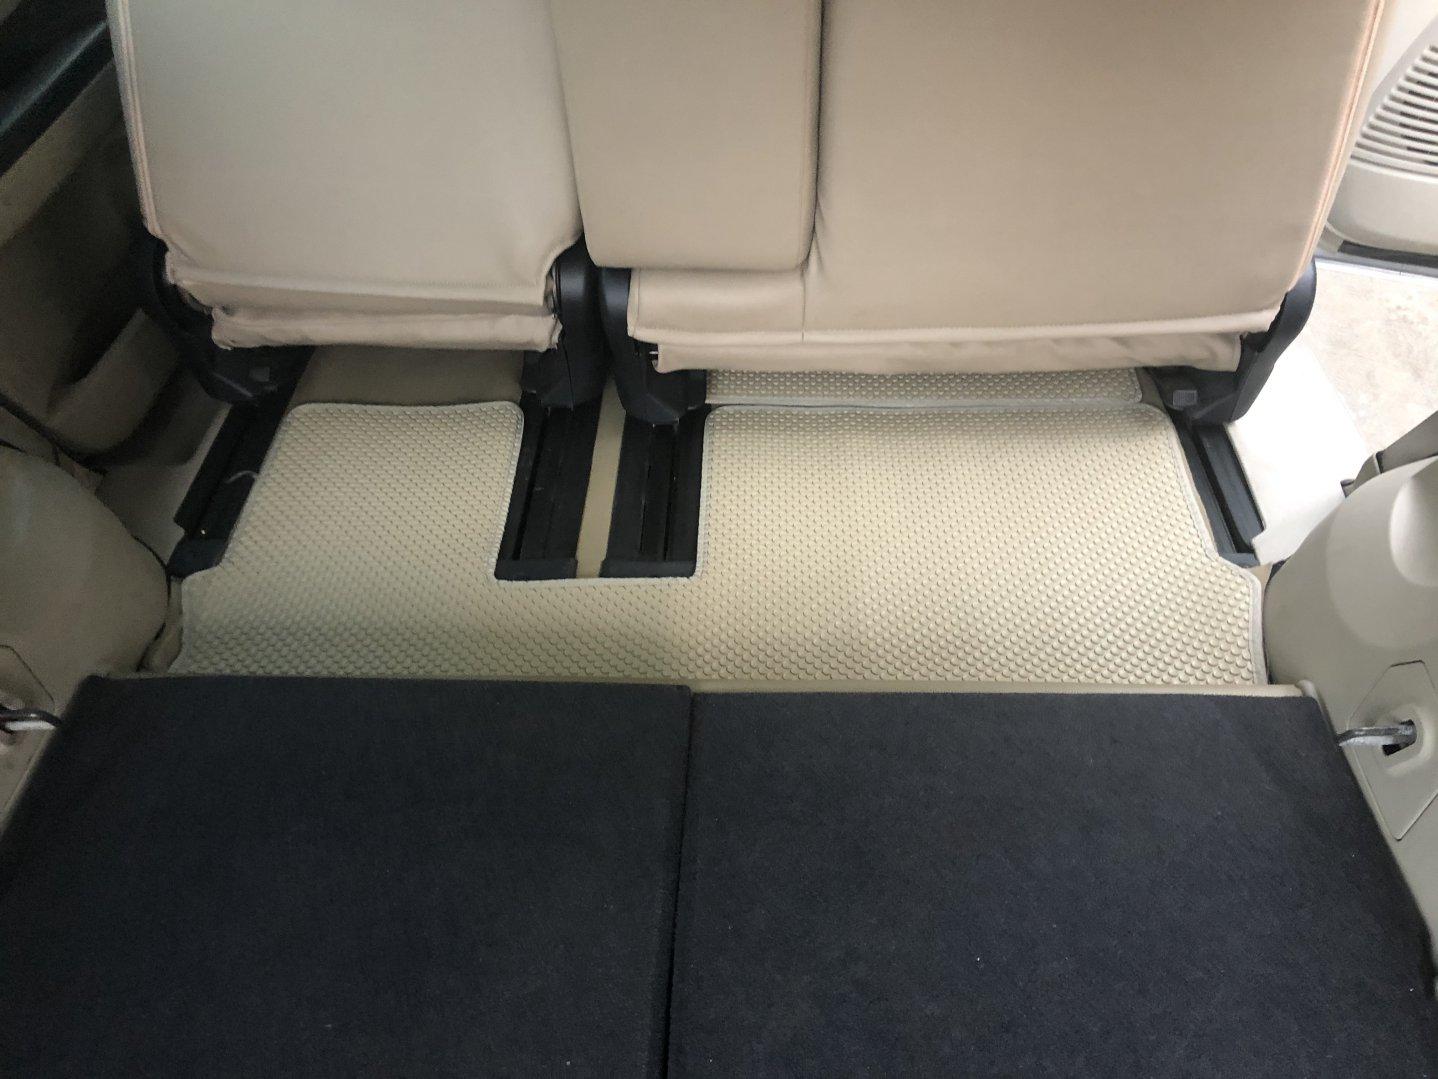 Thảm lót sàn KATA Mitsubishi Grandis